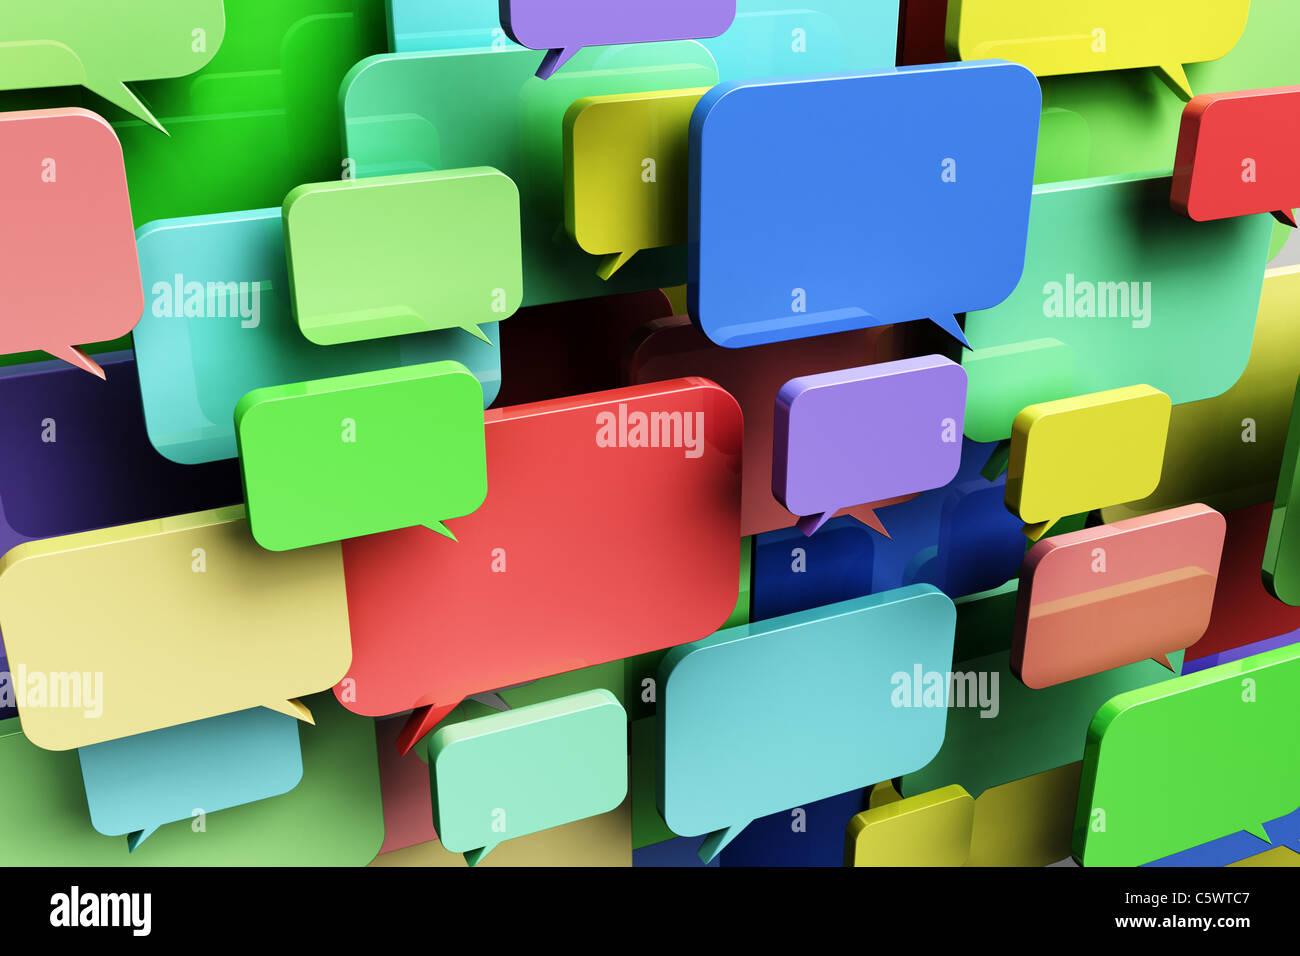 Concepto de redes sociales Imagen De Stock